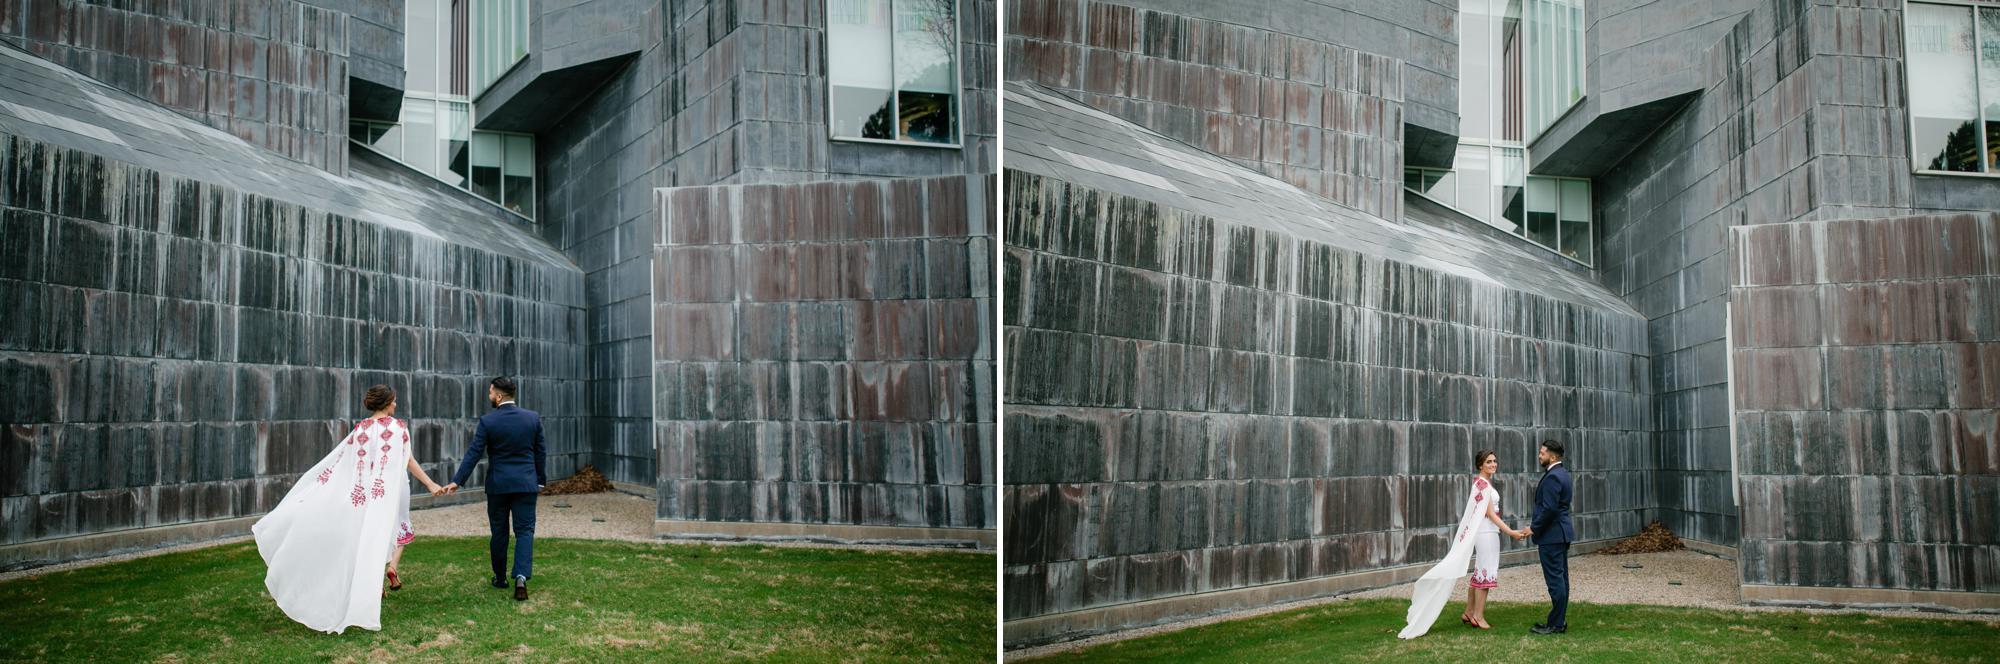 toledo-museum-glass-pavilion-wedding-photos-2.jpg